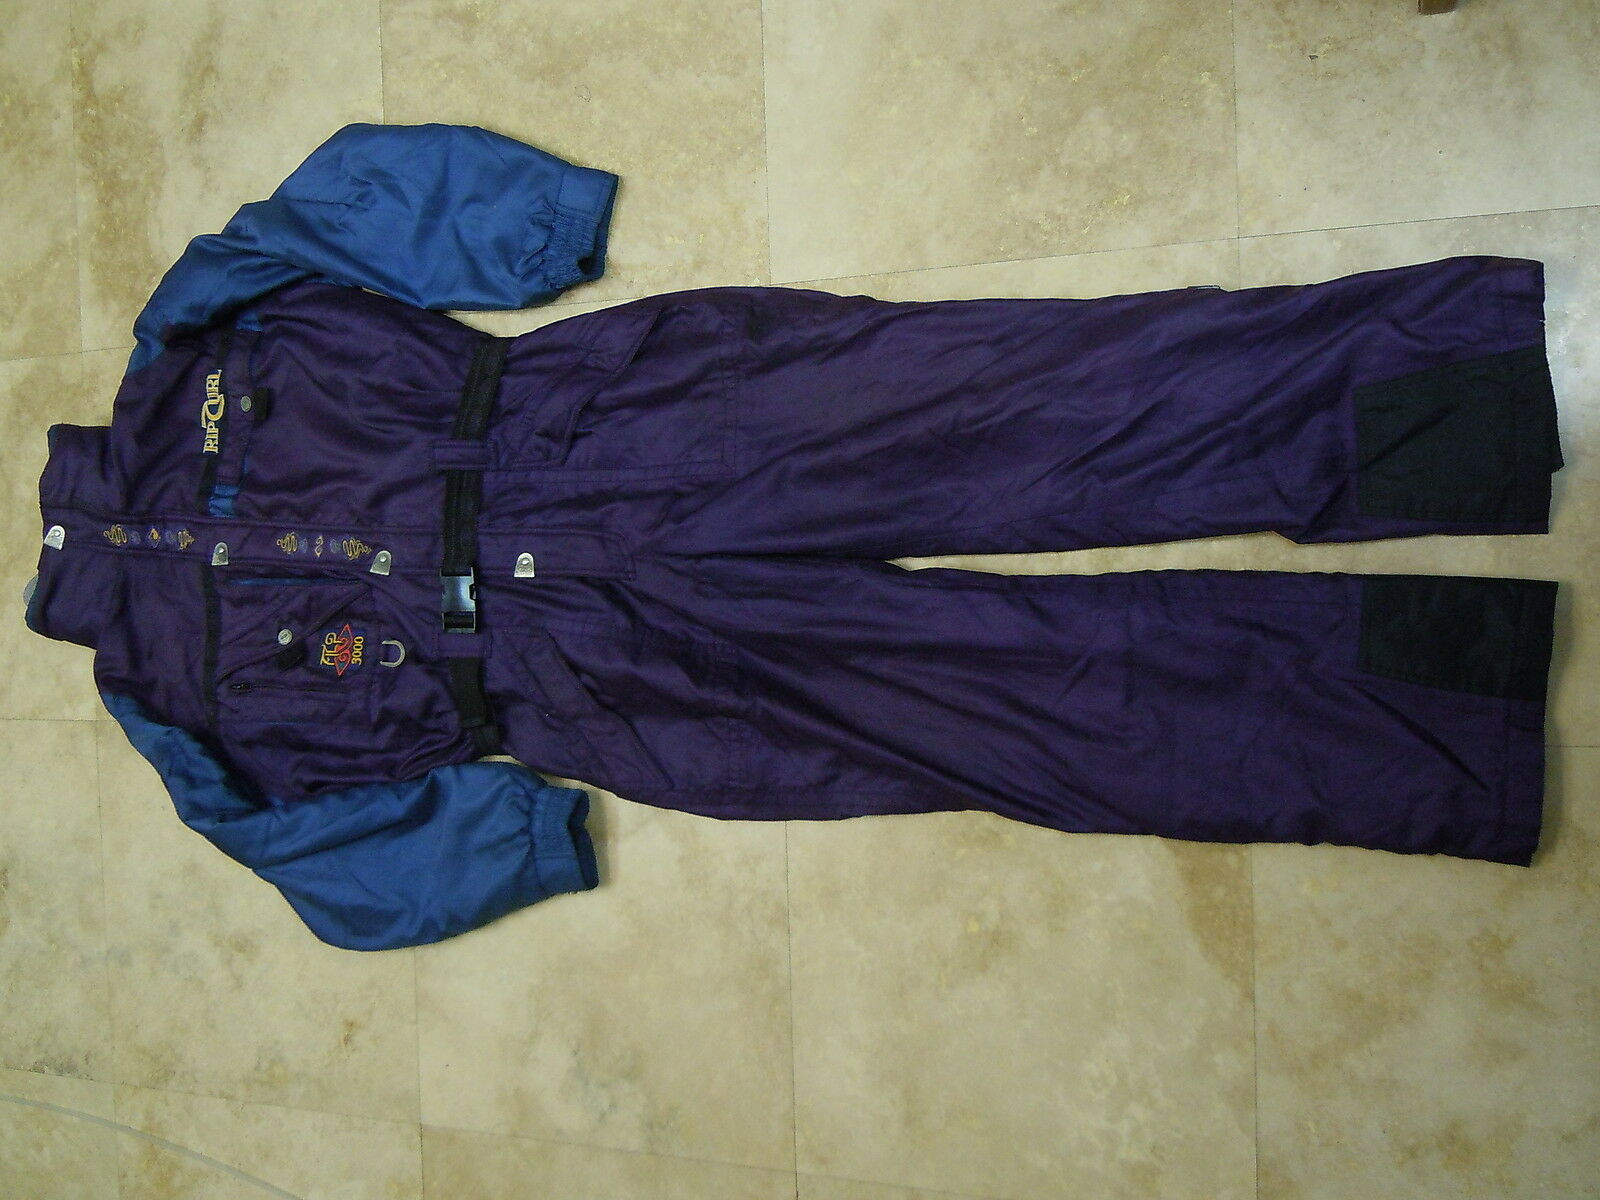 Vintage Rip Curl Alp 3000 Full Snowsuit Snow Ski Suit Größe Mens Medium